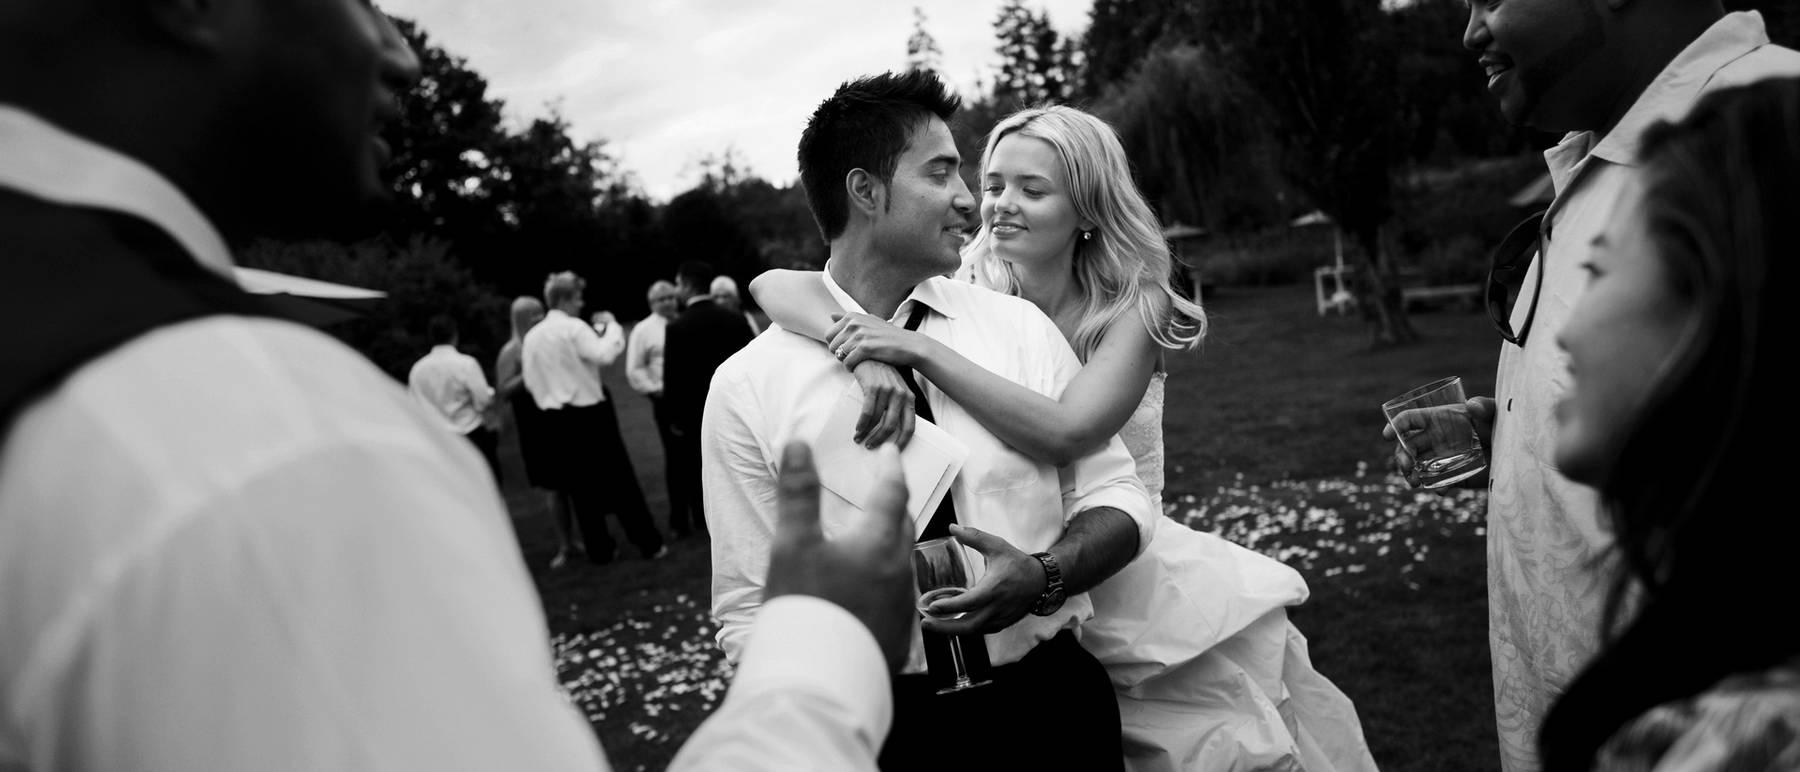 johnandjoseph-wedding-photographer-hz-slider-218